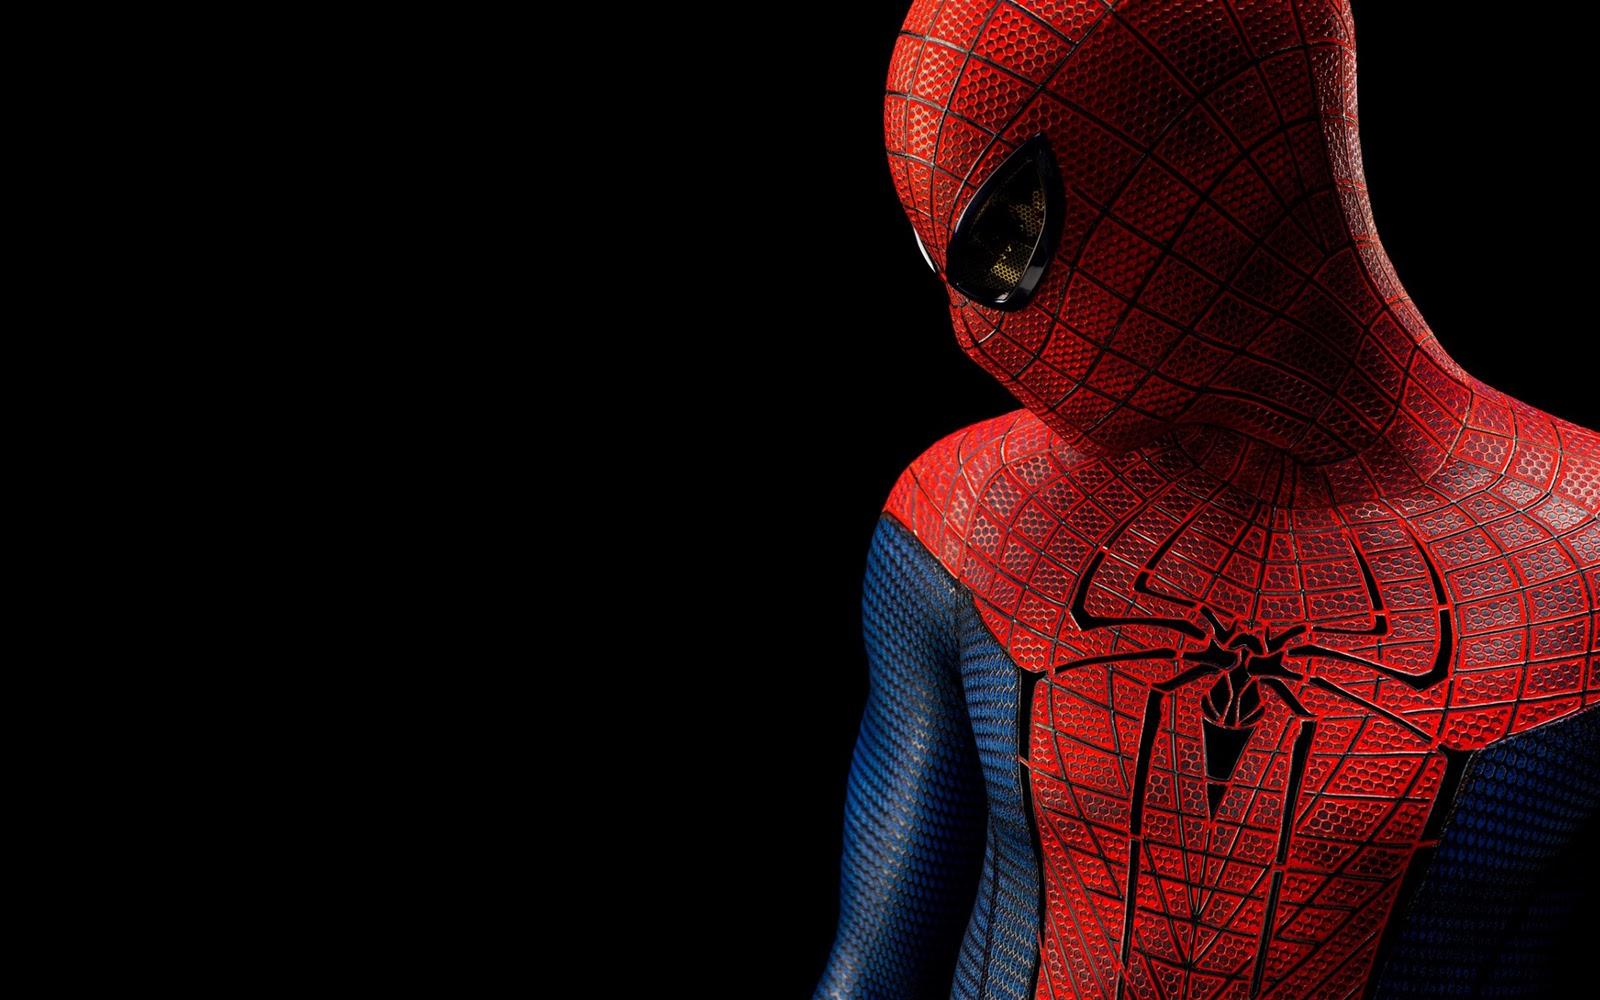 http://4.bp.blogspot.com/-BB29YXmF5nA/T_Mzi2-5UdI/AAAAAAAADIc/Yrtm80AQgOk/s1600/The-Amazing-Spider-Man-2012-Wallpaper-HD1.jpg